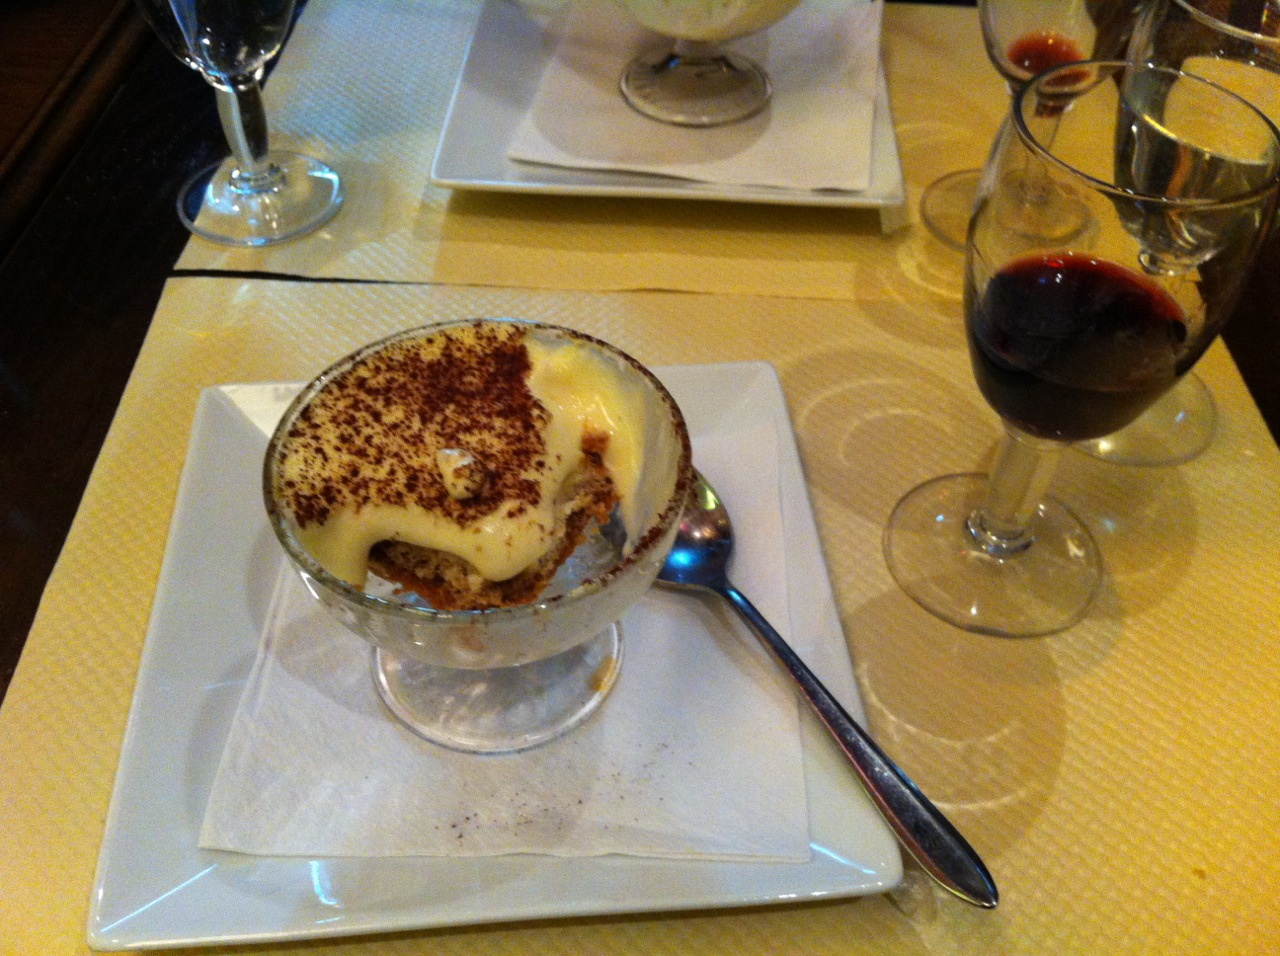 The tiramisu for dessert was delicious!